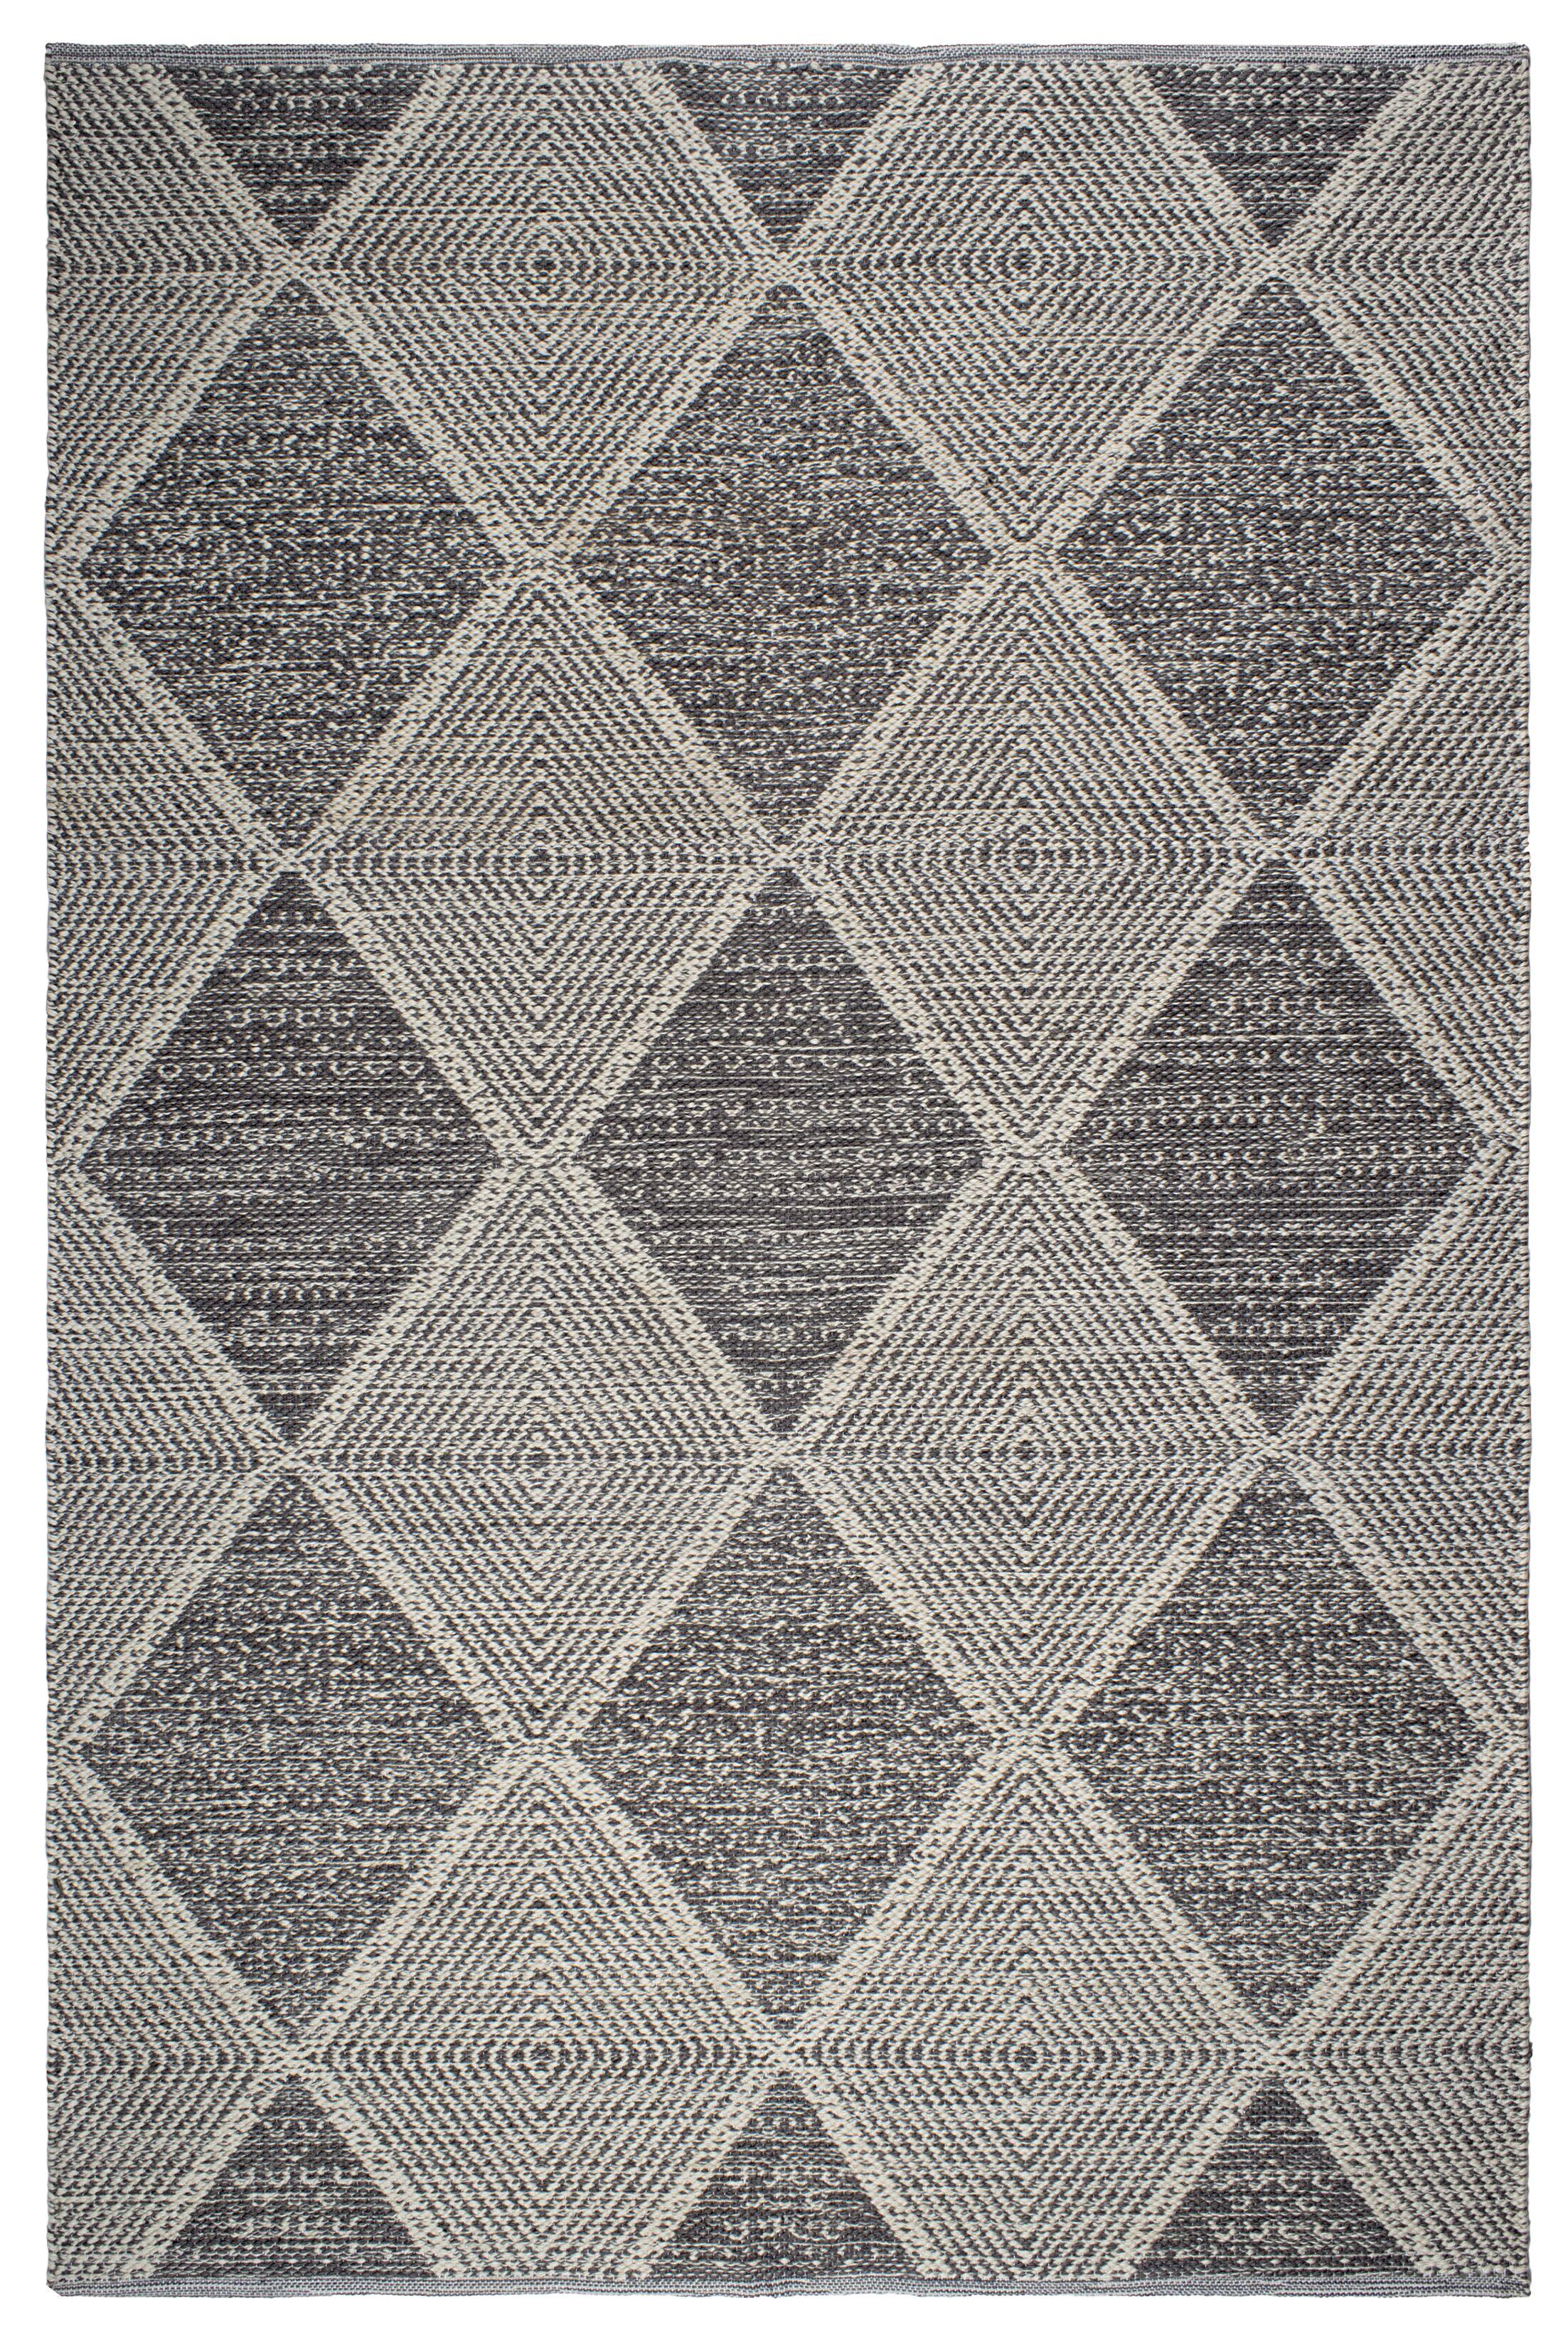 Cowger Hampton Hand-Woven Gray Indoor/Outdoor Area Rug Rug Size: 4' x 6'